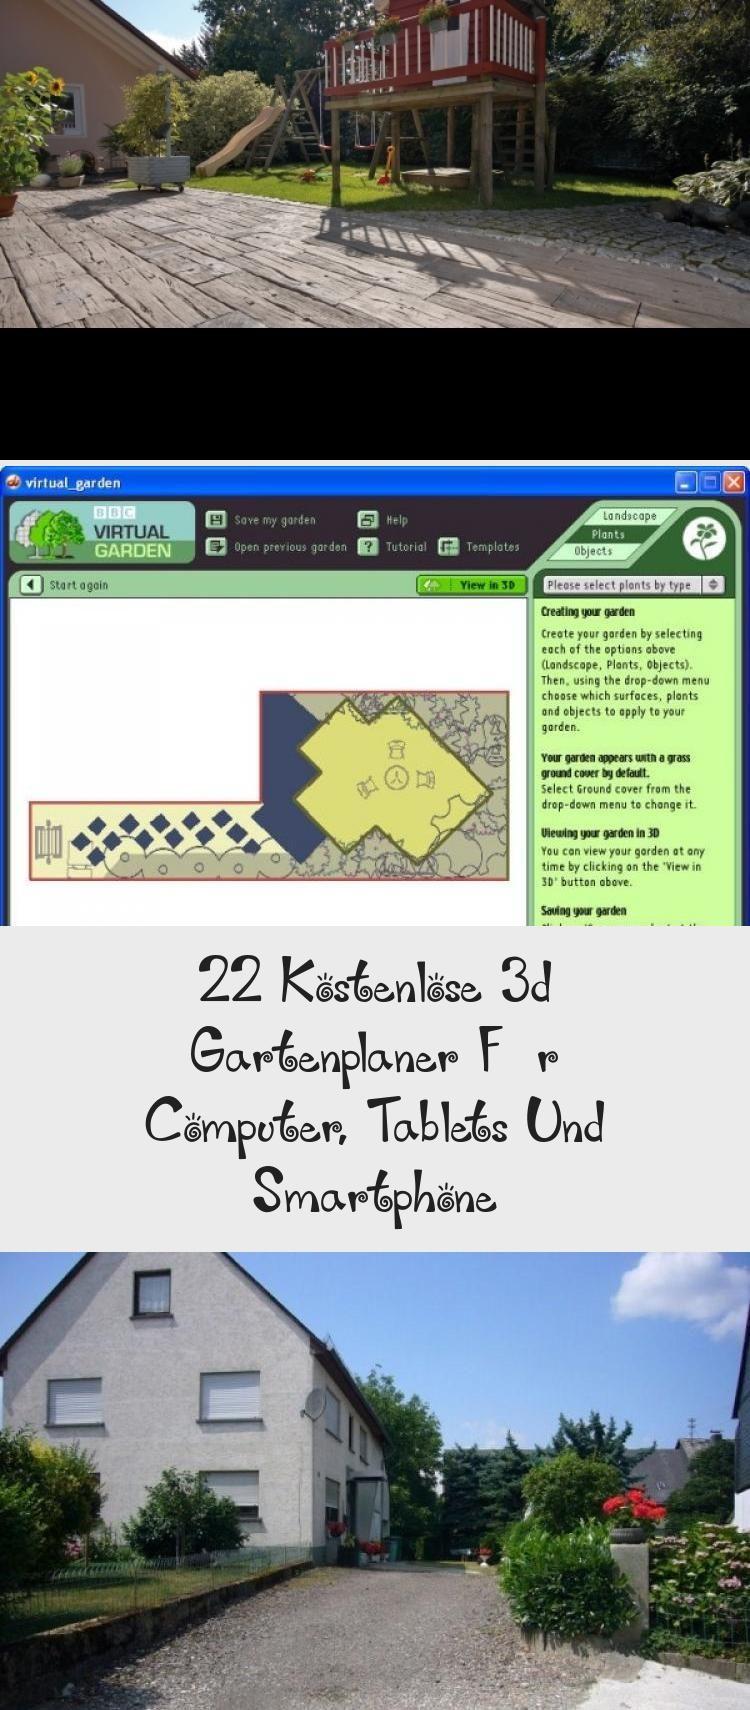 Planer Landschaftsbau Online Software Mein Schoener Garten Planungstool Gartenplanunggestaltung Gartenplanungmitpool Gartenplanung In 2020 Tutorial Garden Templates